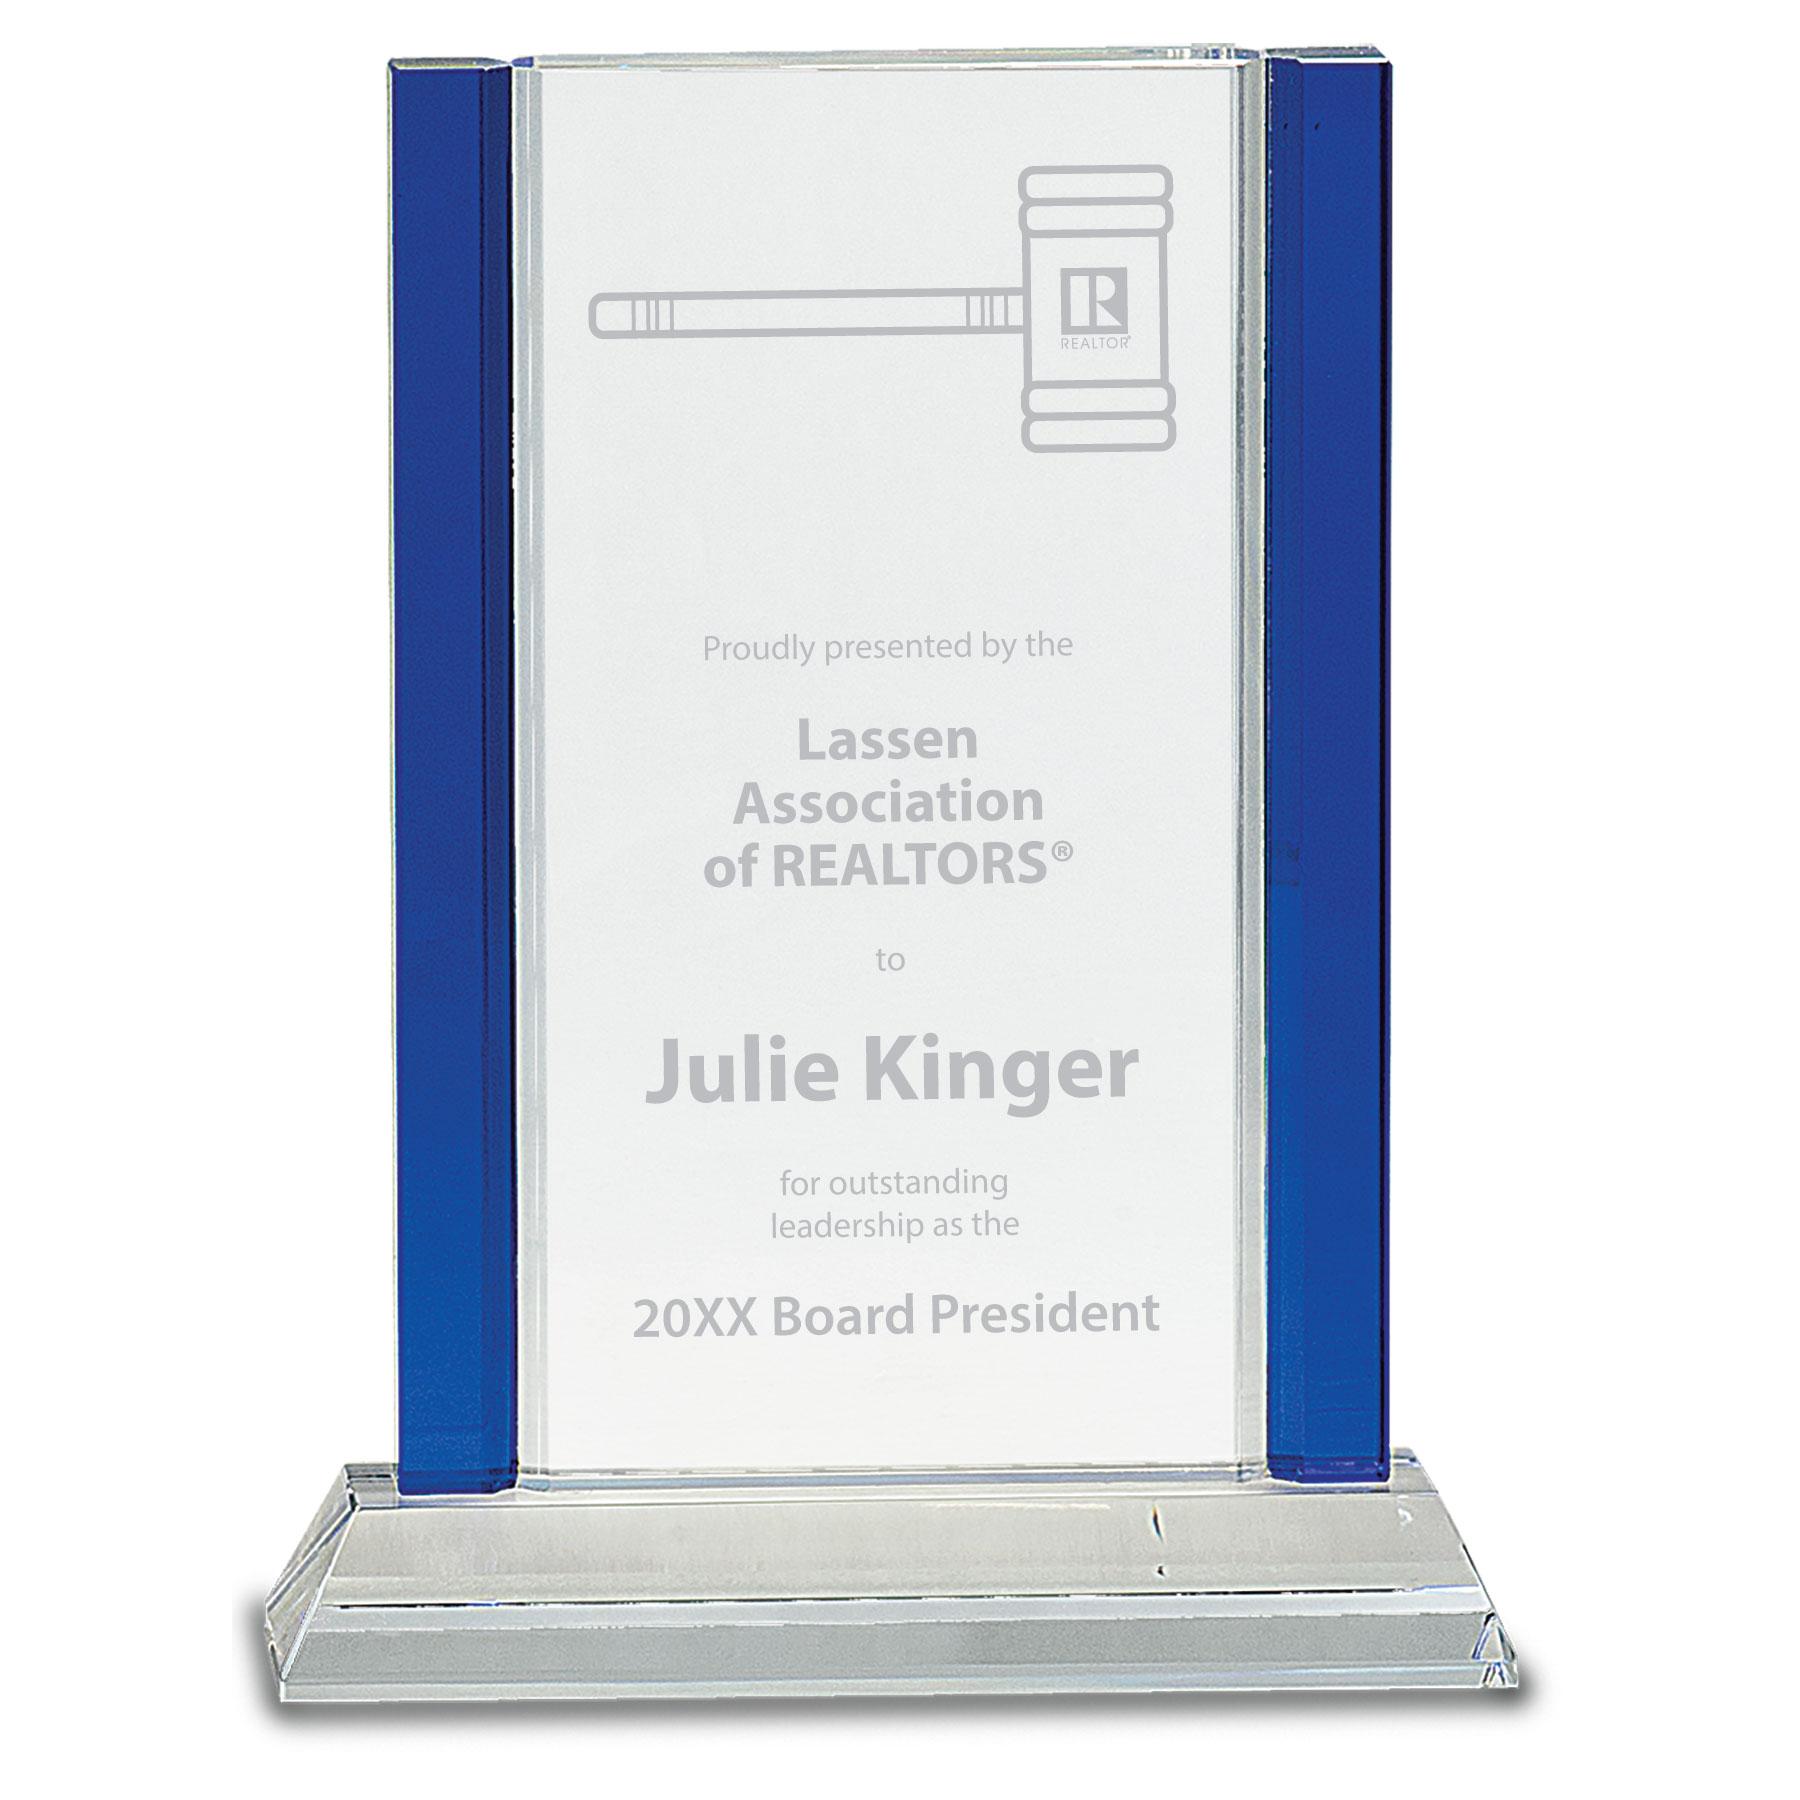 Crystal Blue Edge Award Awards,Award,Plaque,Plaques,Crystal,Glass